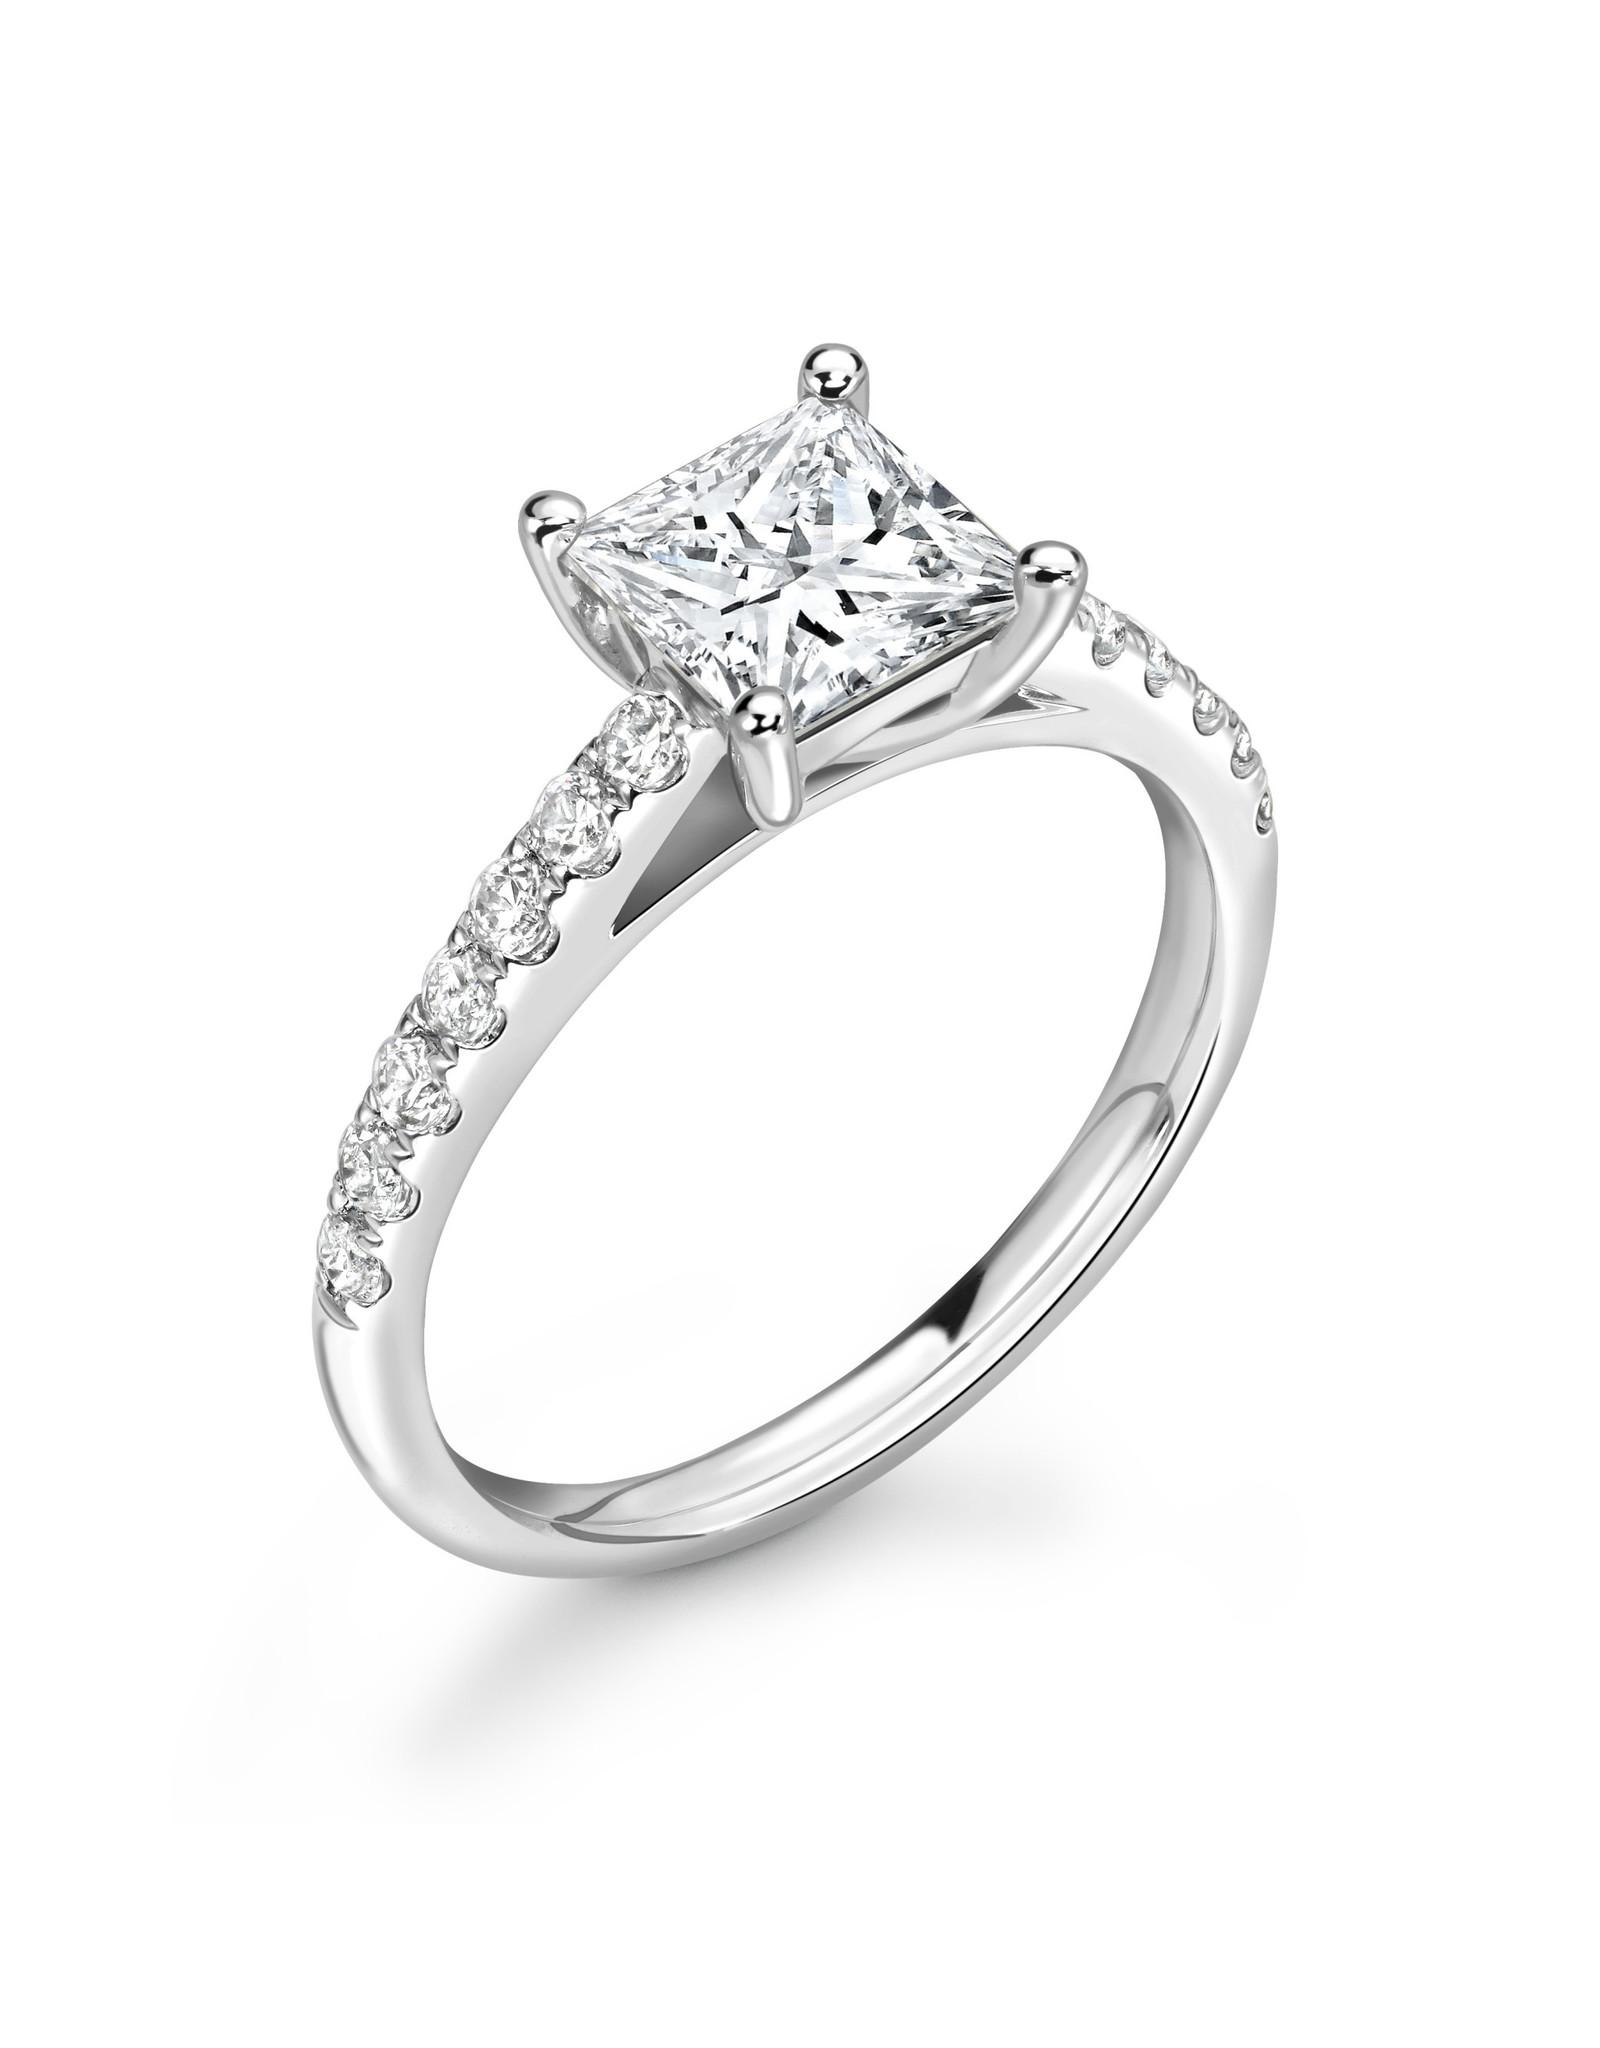 LVN Princesse Verlovingsring Met Zijsteentjes LVNRX3200